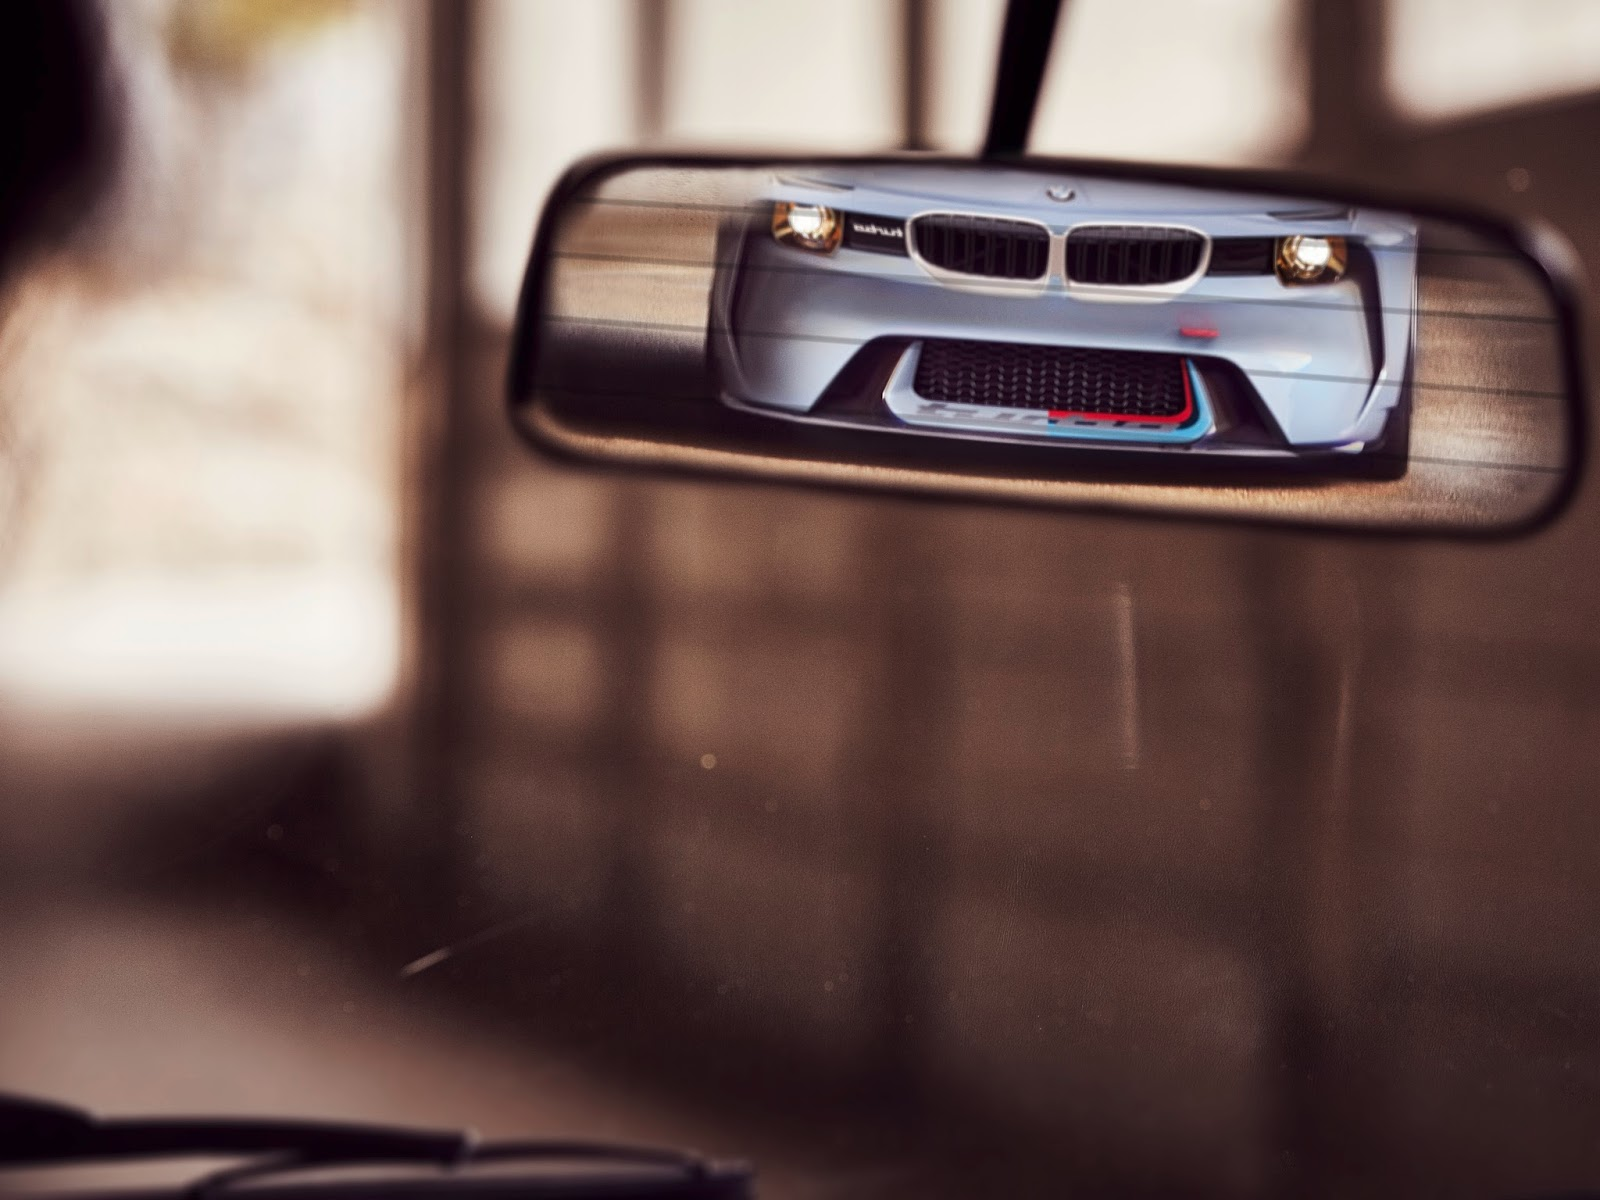 P90219726 highRes bmw 2002 hommage 05 1 1 H BMW γιορτάζει τα 50 χρόνια της θρυλικής 2002 turbo και παρουσιάζει την Bmw 2002 Hommage BMW, BMW 2002, BMW 2002 turbo, BMW Concept, BMW Hommage, supercars, videos